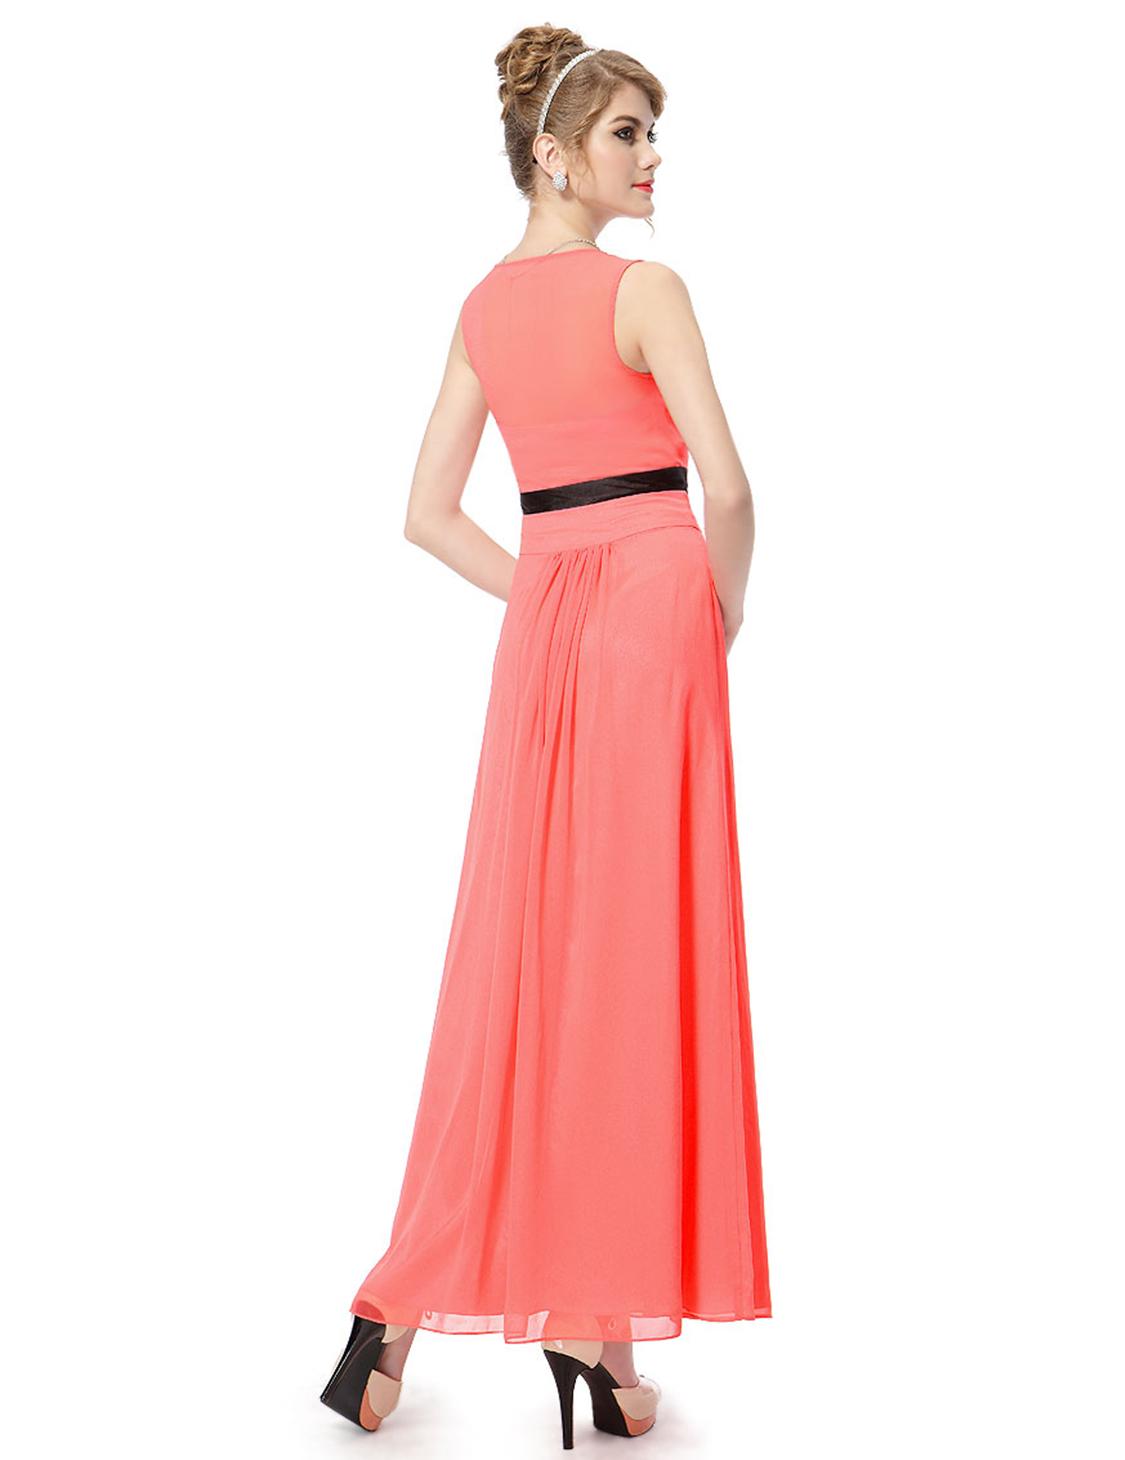 Wedding Dresses 08053 : Ever pretty free shipping coral ladies long bridesmaid